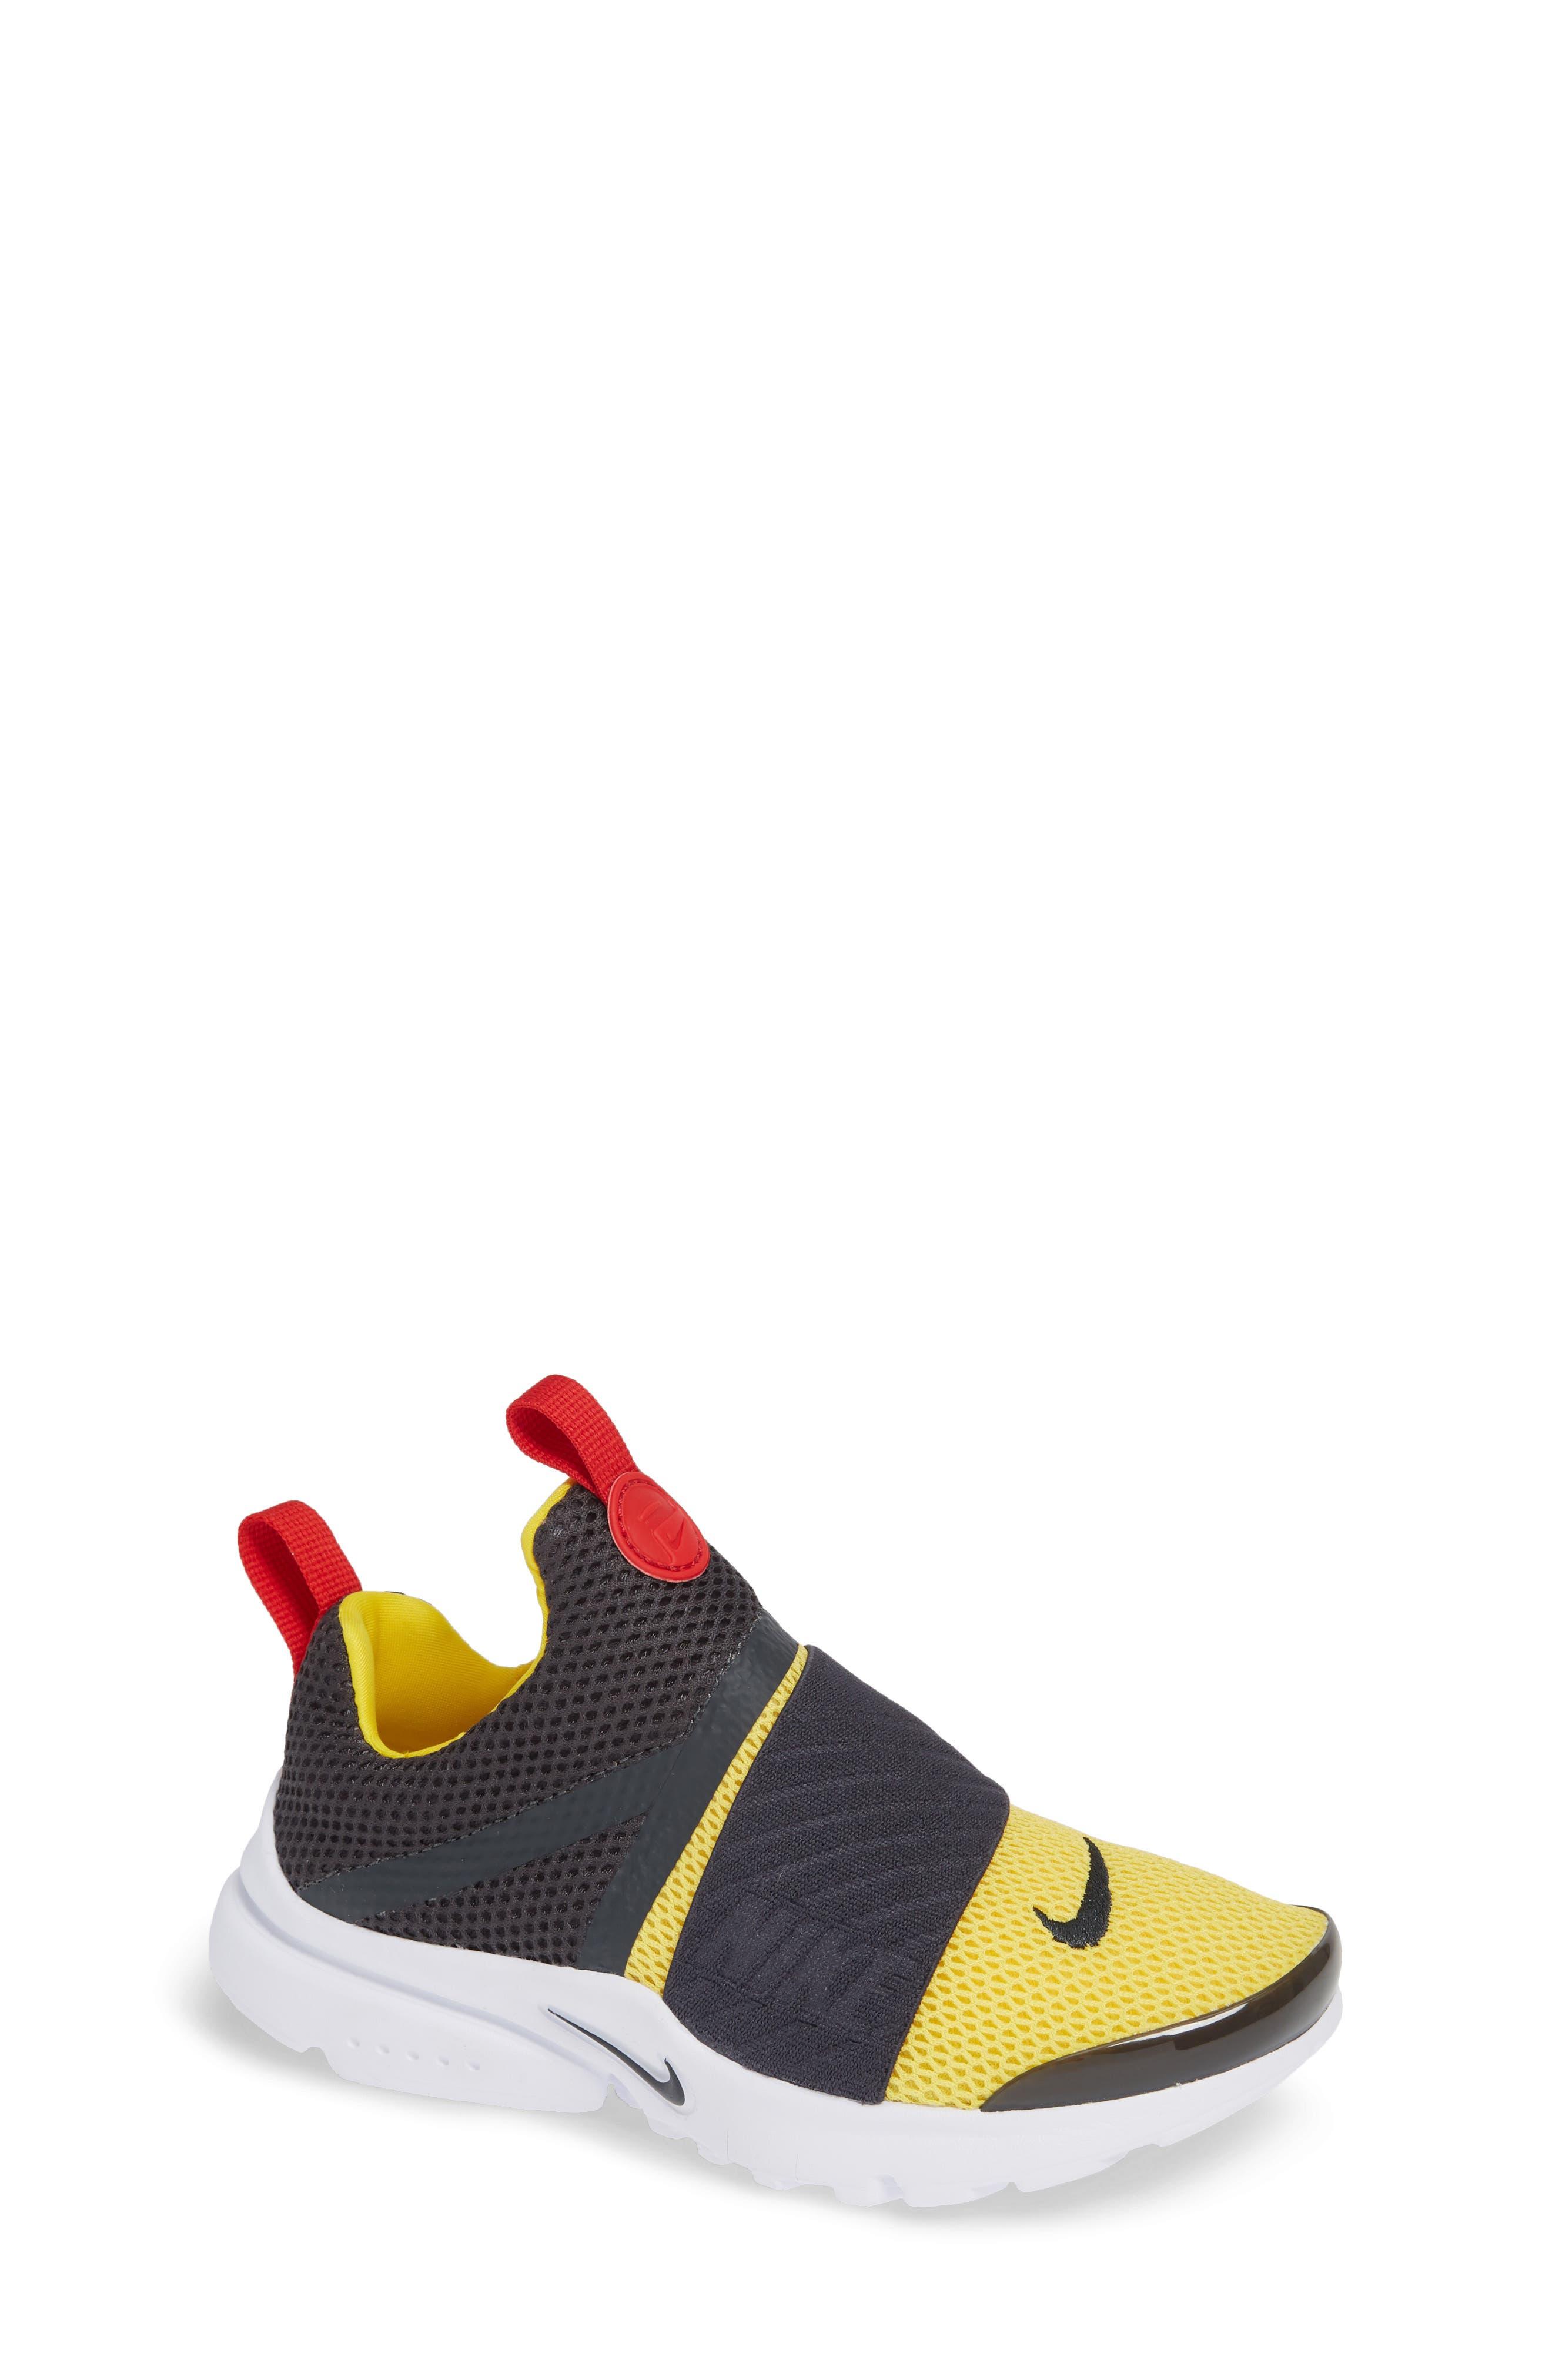 Presto Extreme Sneaker,                         Main,                         color, ANTHRACITE/ TOUR YELLOW